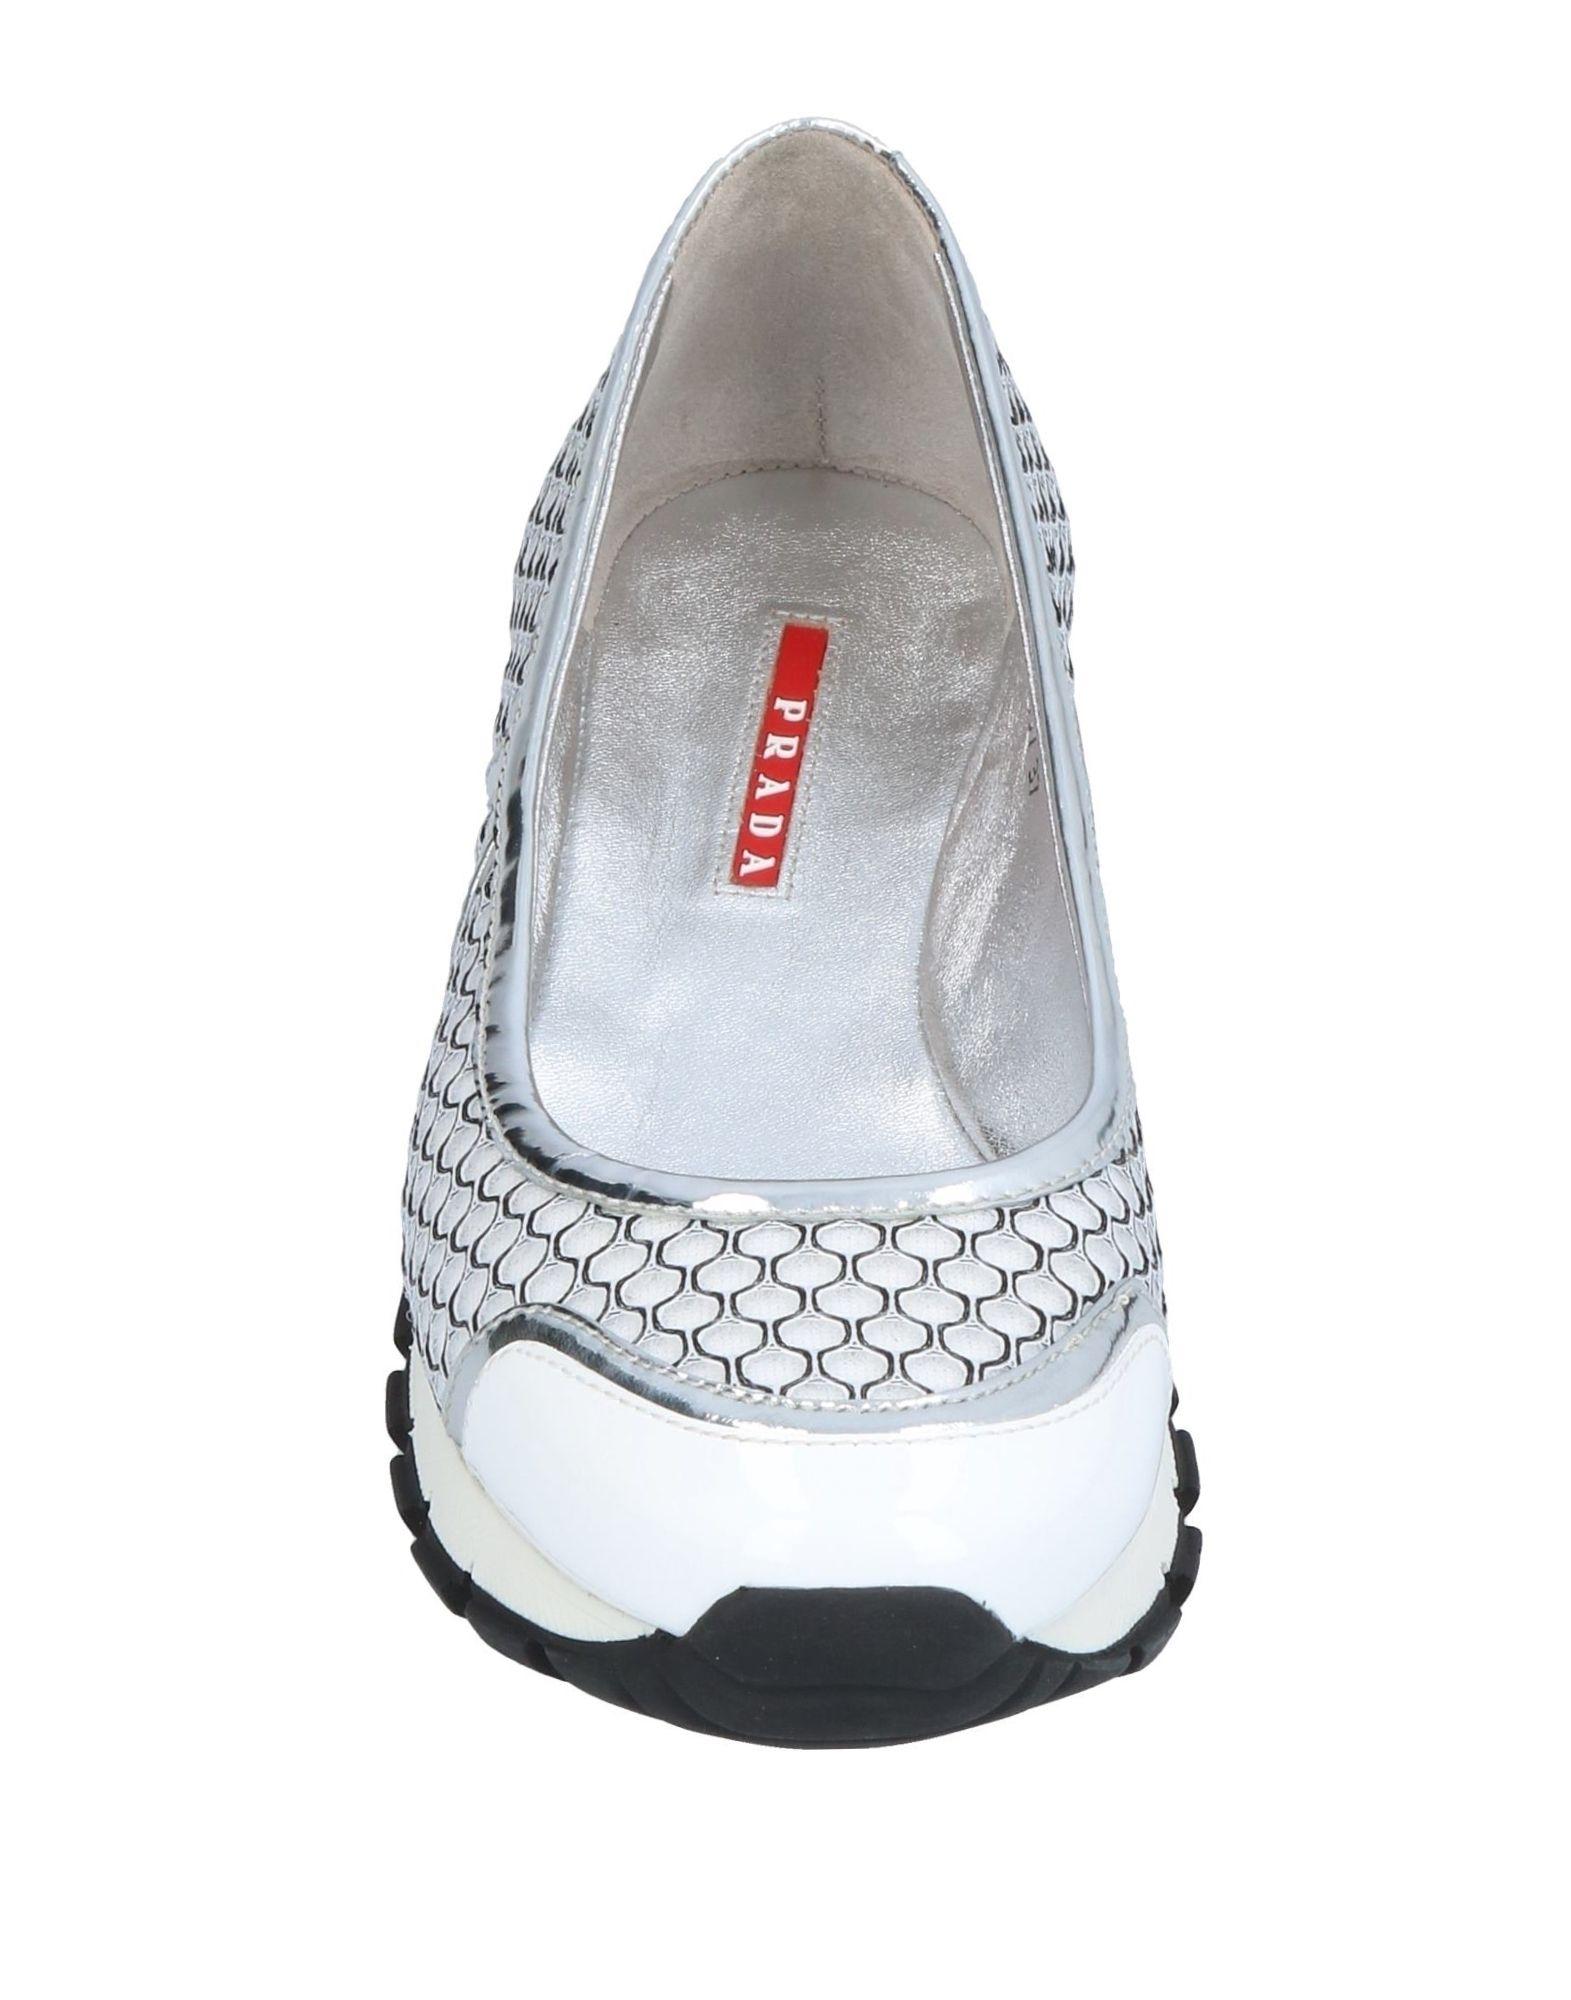 Prada Damen Sport Pumps Damen Prada  11407765NC Beliebte Schuhe 068146